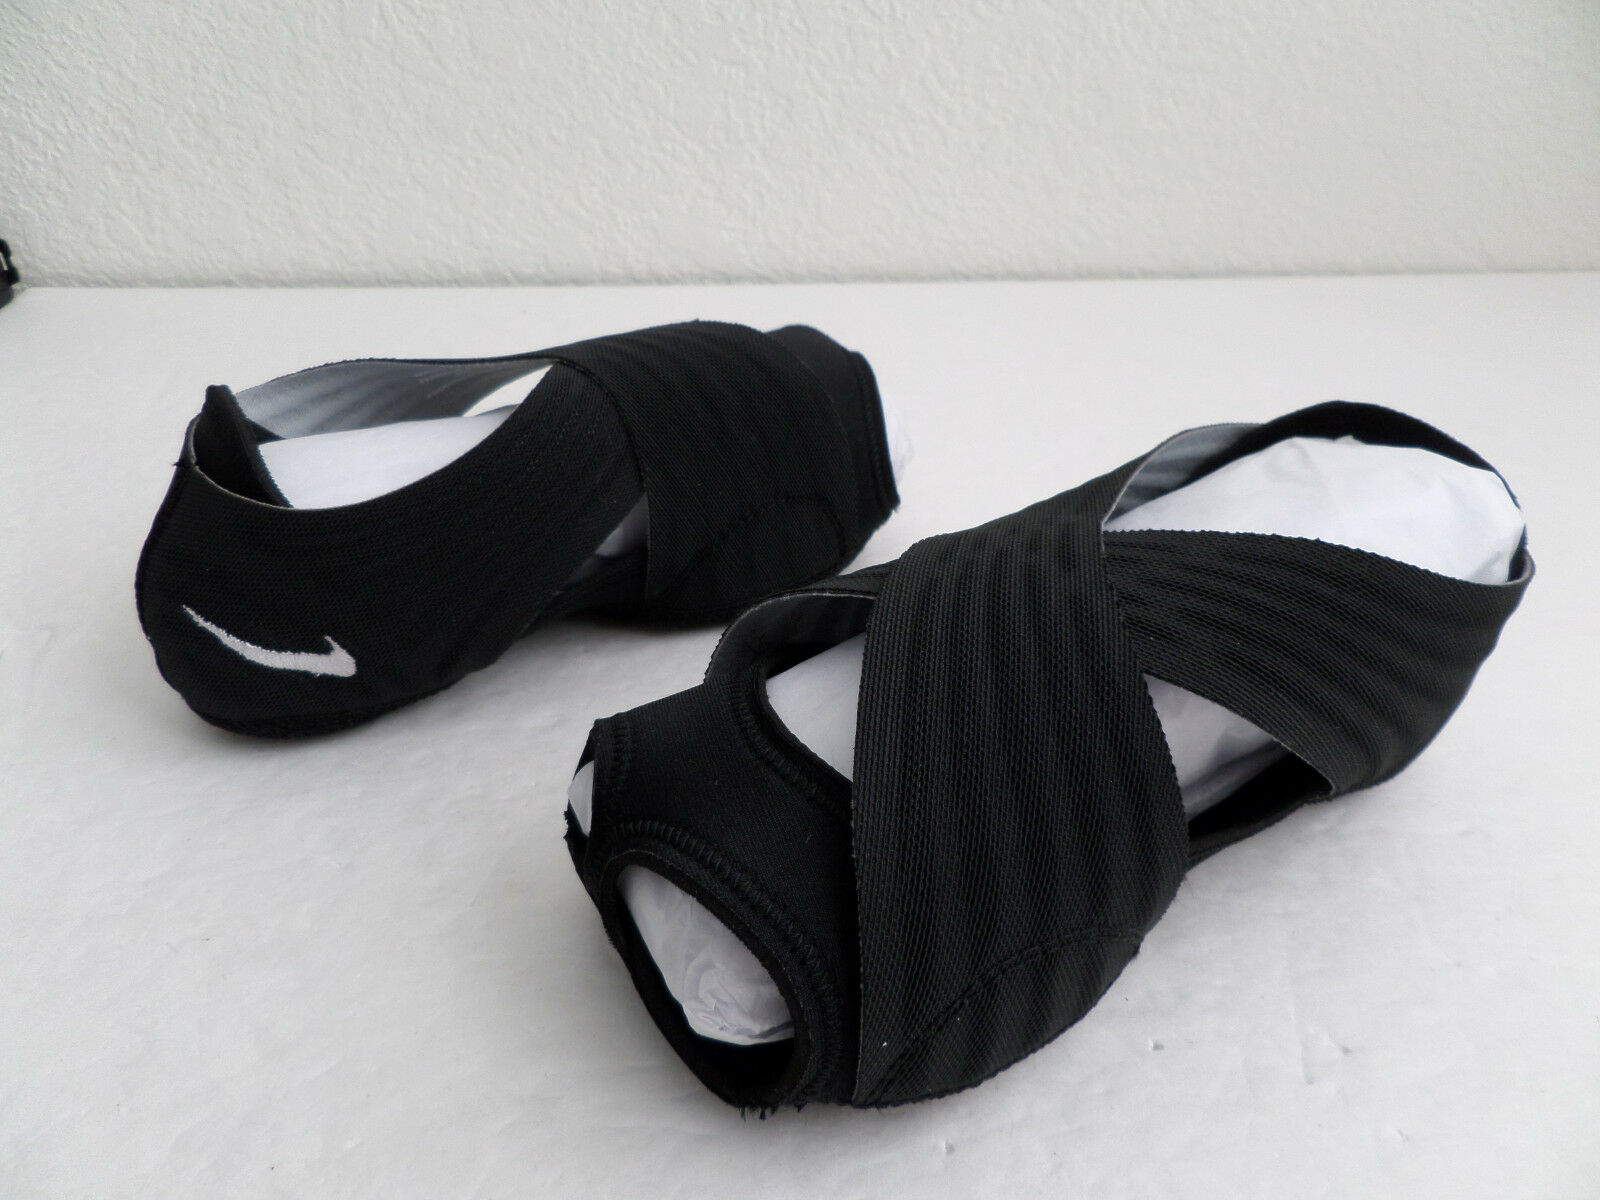 Nike Studio Wrap 3 Women's Training Training Training shoes Black 684861 001 (size XS) b4c149